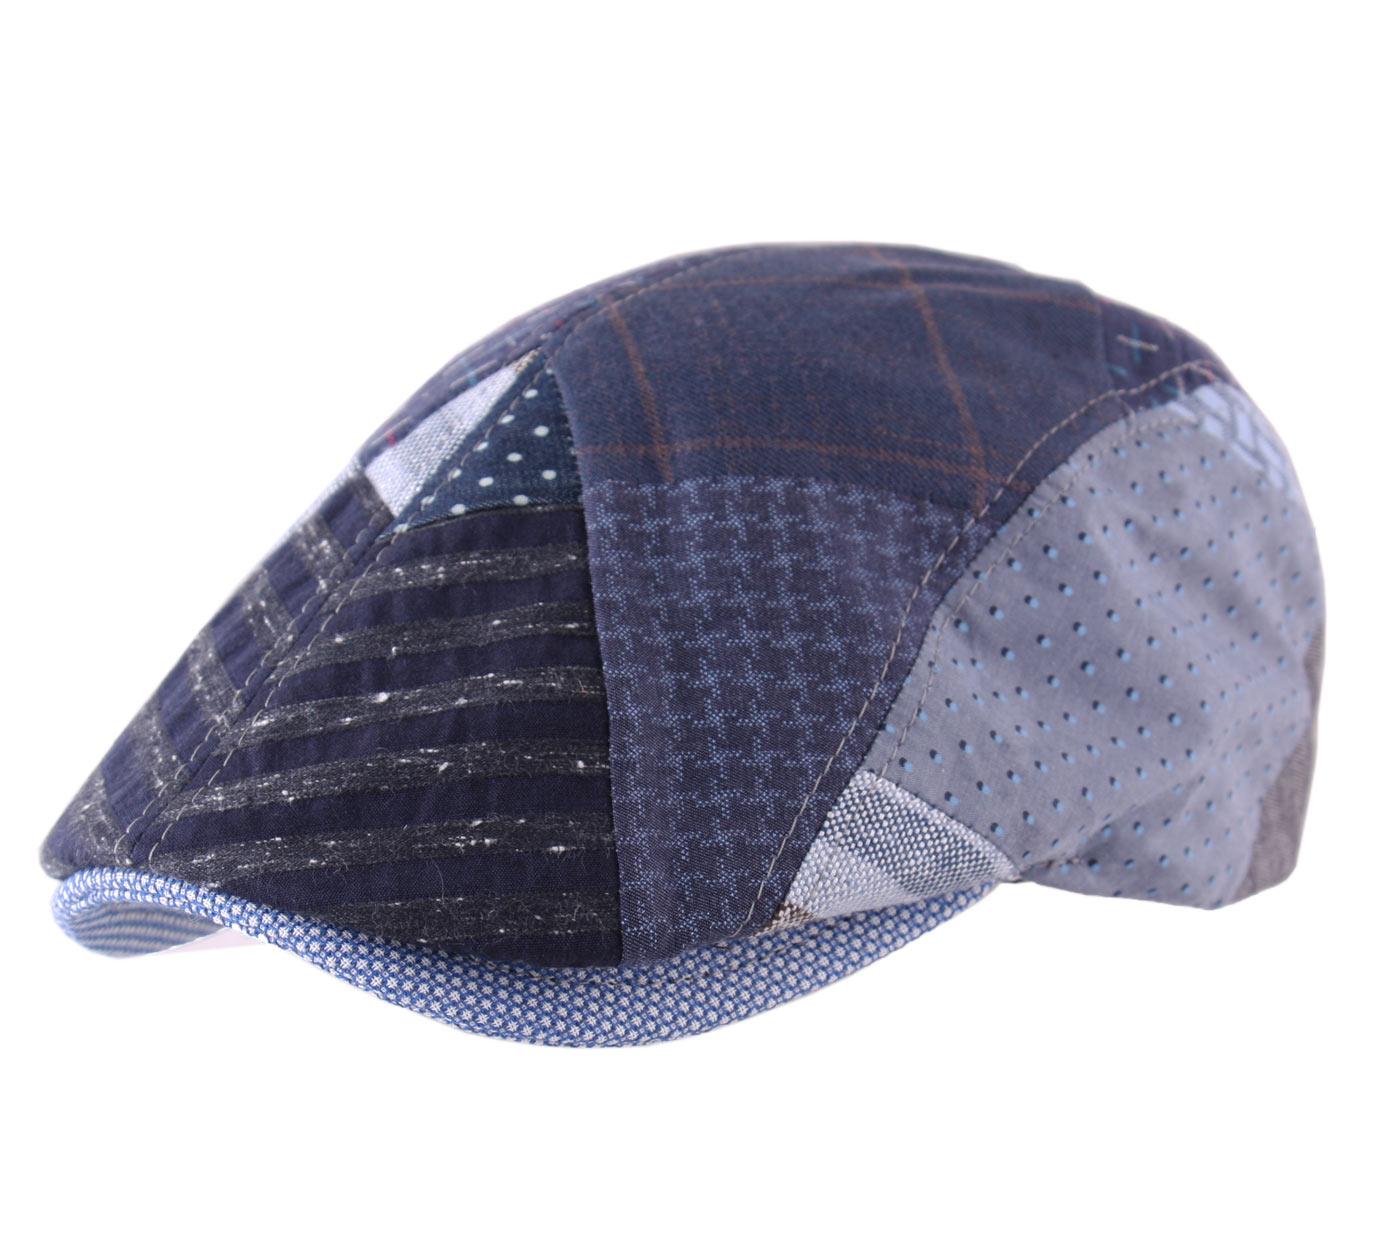 b ret casquette plate homme ou femme classic cap patchwork bleu ebay. Black Bedroom Furniture Sets. Home Design Ideas